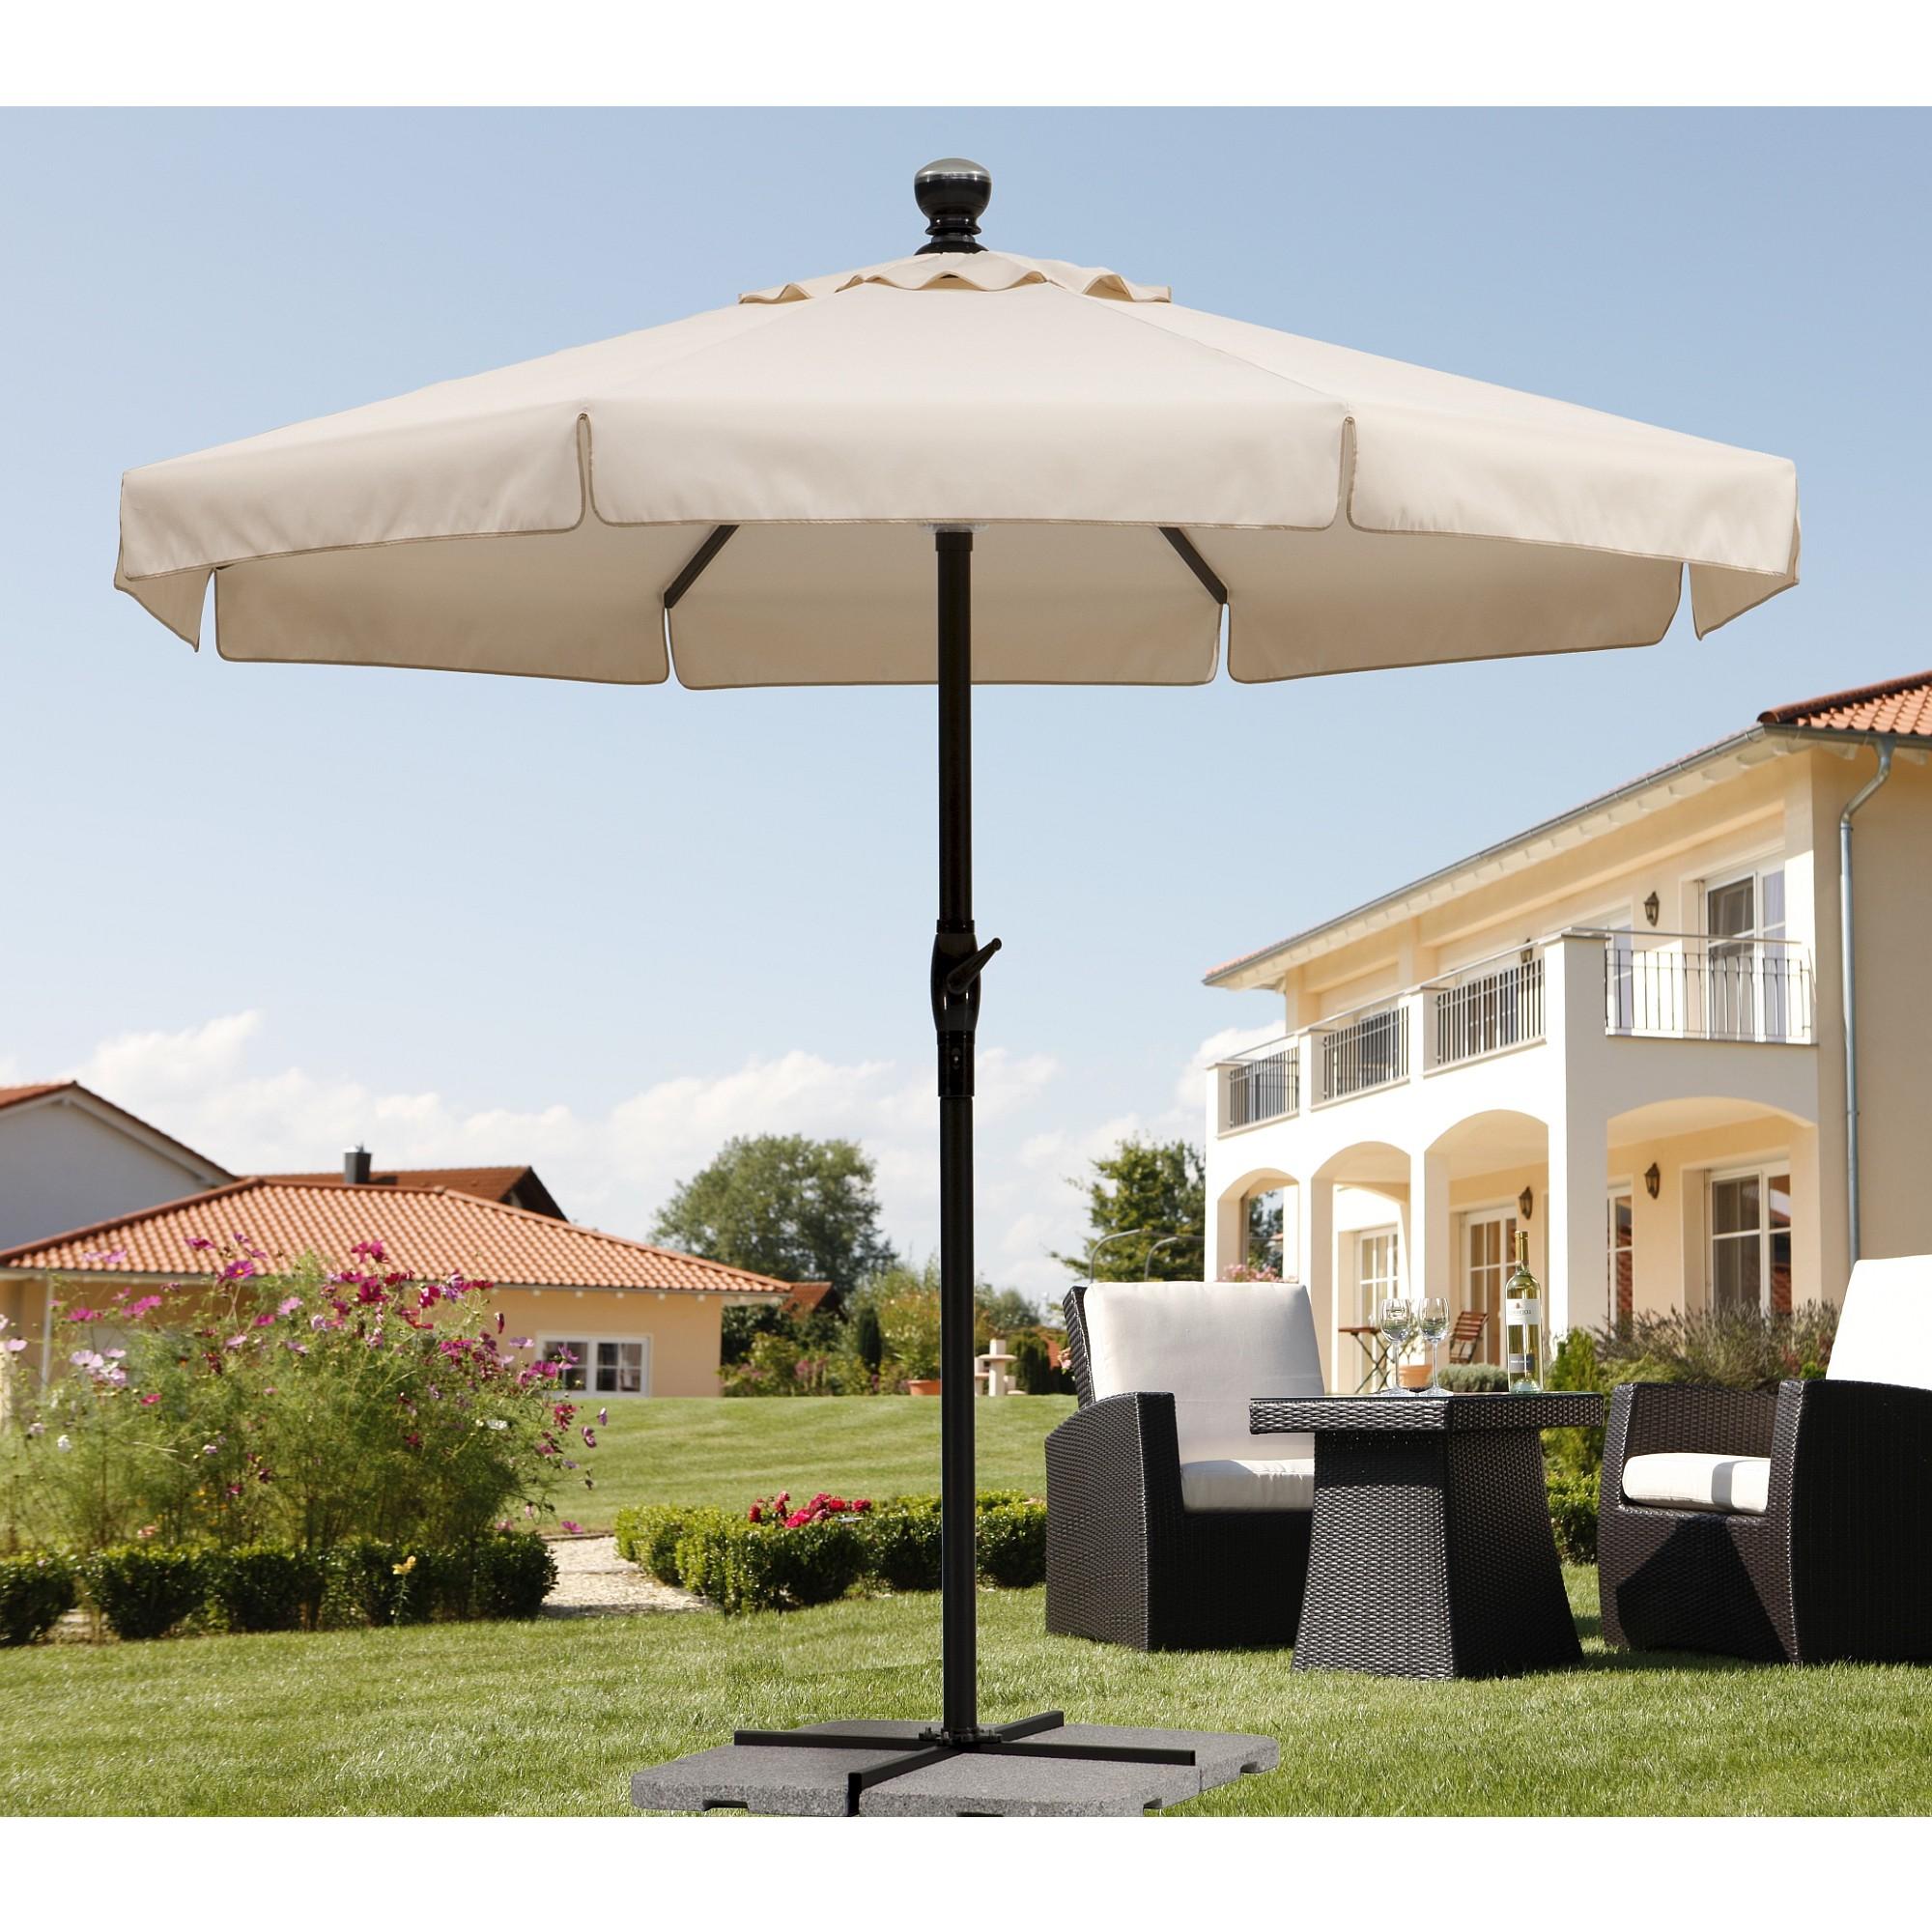 sonnenschirm prima tec 350 inkl motor licht nur 299 99 cherry m bel home24. Black Bedroom Furniture Sets. Home Design Ideas